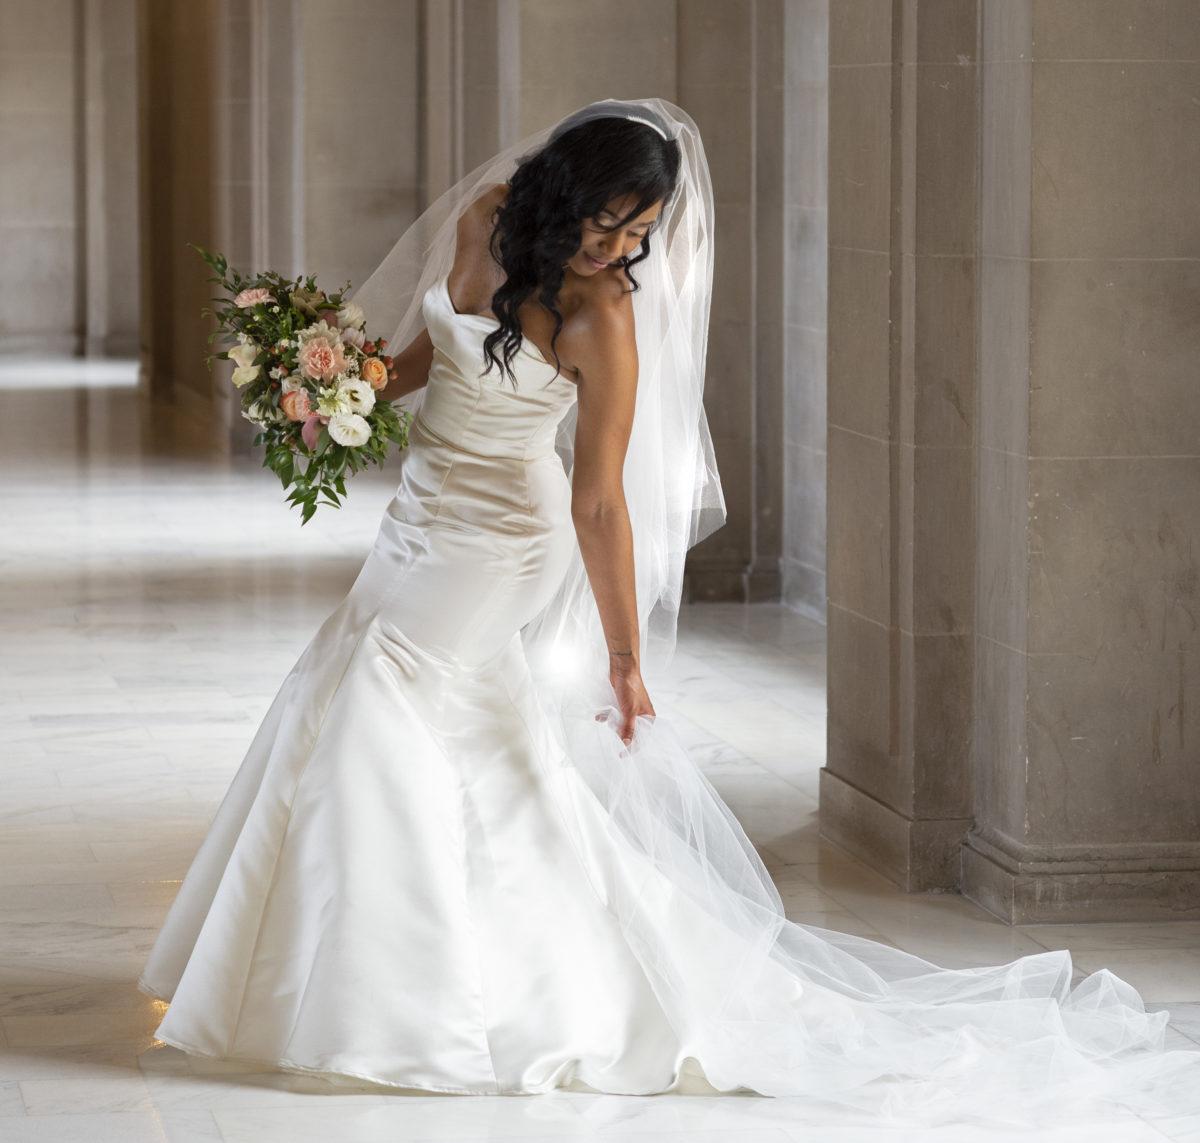 Bride adjusting dress close to the Mayors Balcony.